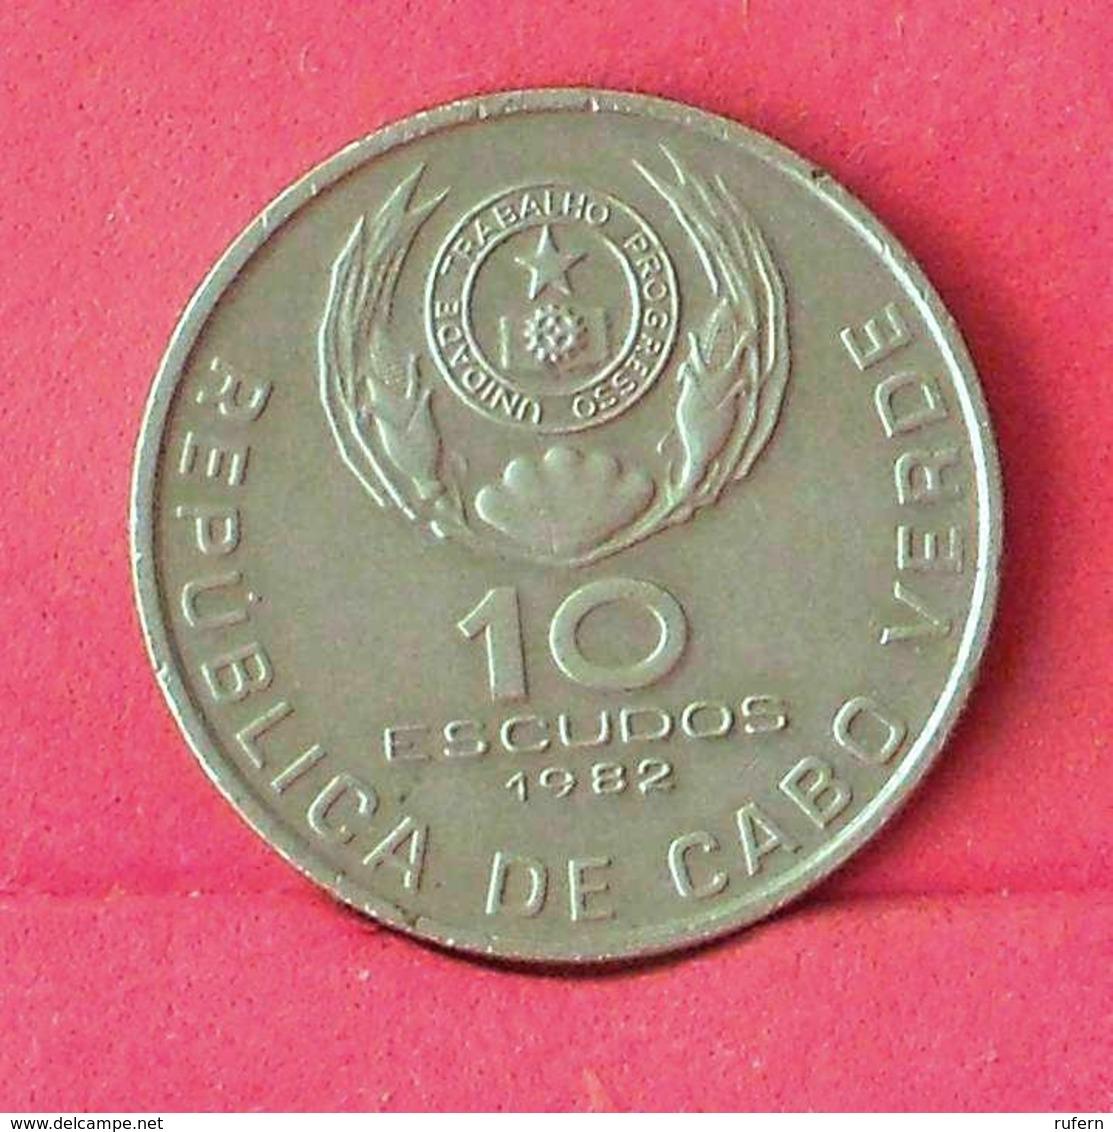 CAPE VERDE 10 ESCUDOS 1982 -    KM# 19 - (Nº27543) - Cap Vert